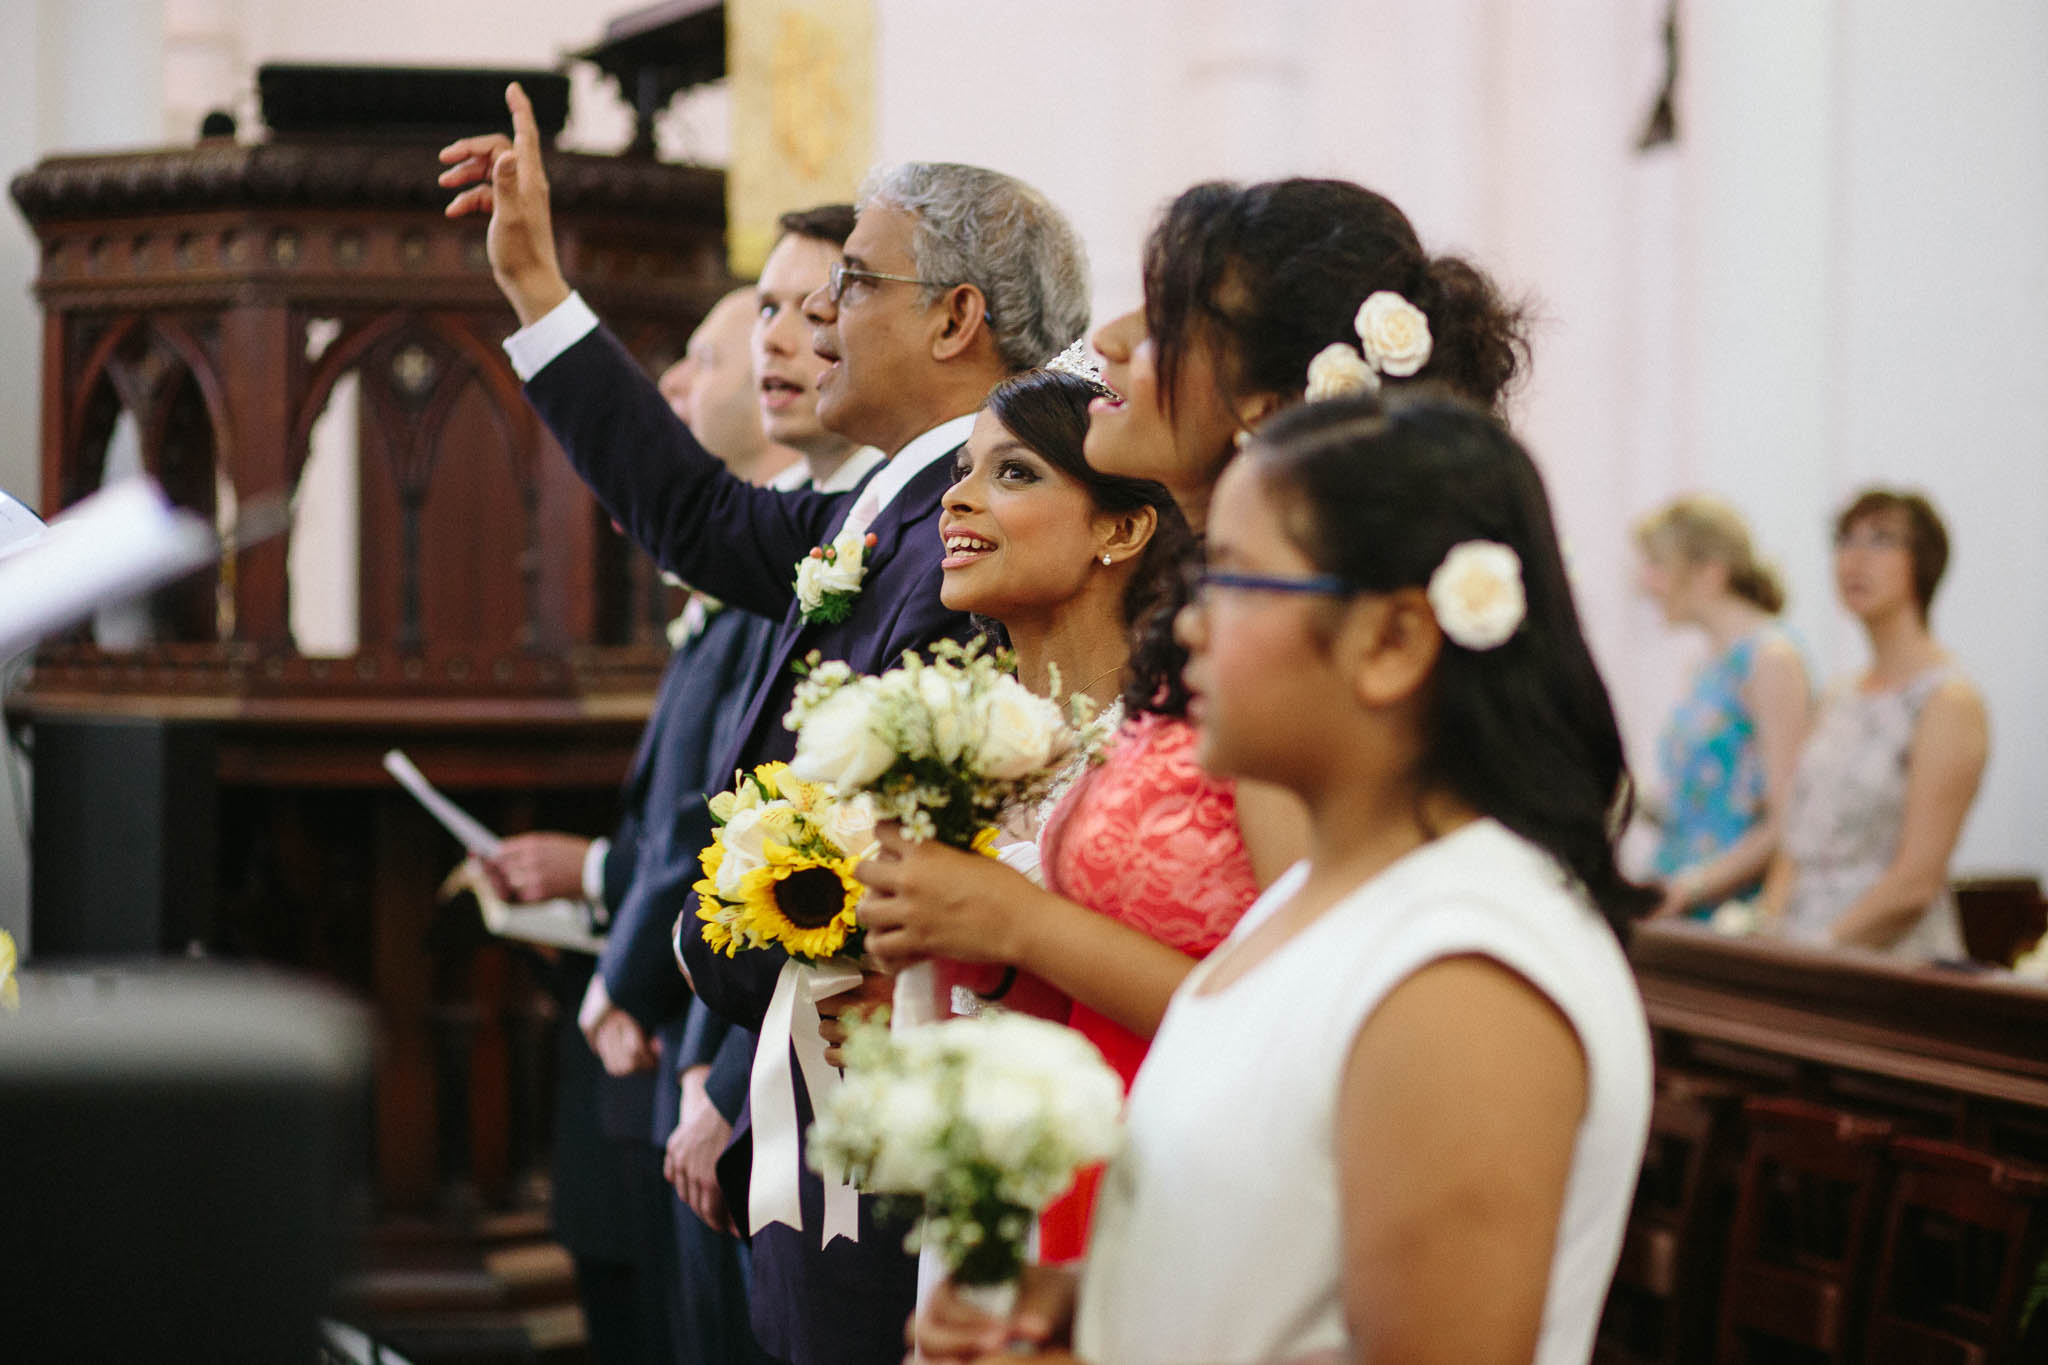 singapore-wedding-photographer-malay-indian-pre-wedding-travel-wmt-2015-40.jpg